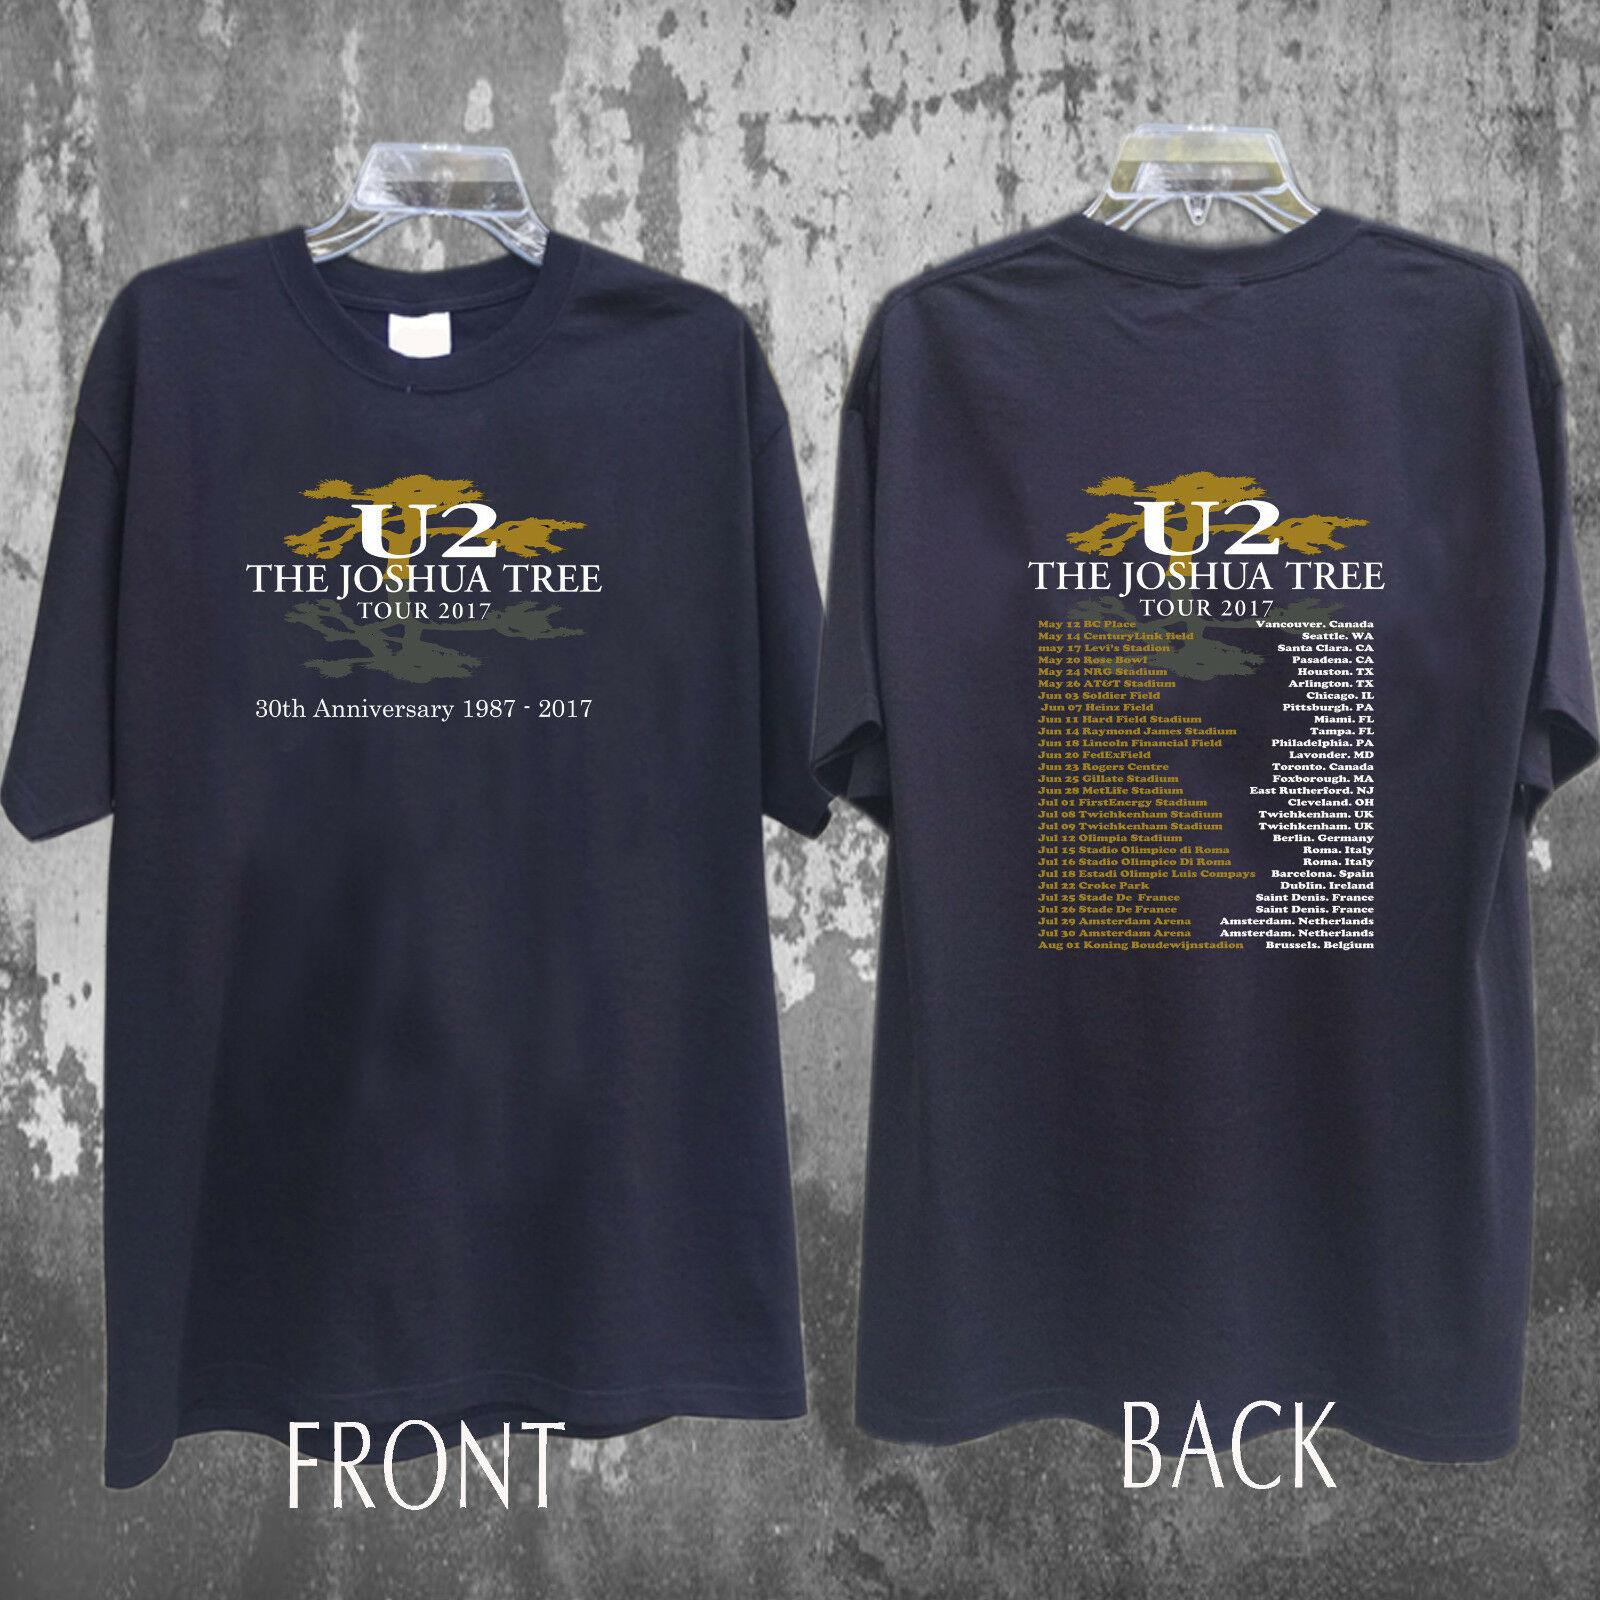 Мужская черная футболка U2 The joшуа дерева 2017, Двусторонняя Футболка унисекс 2019